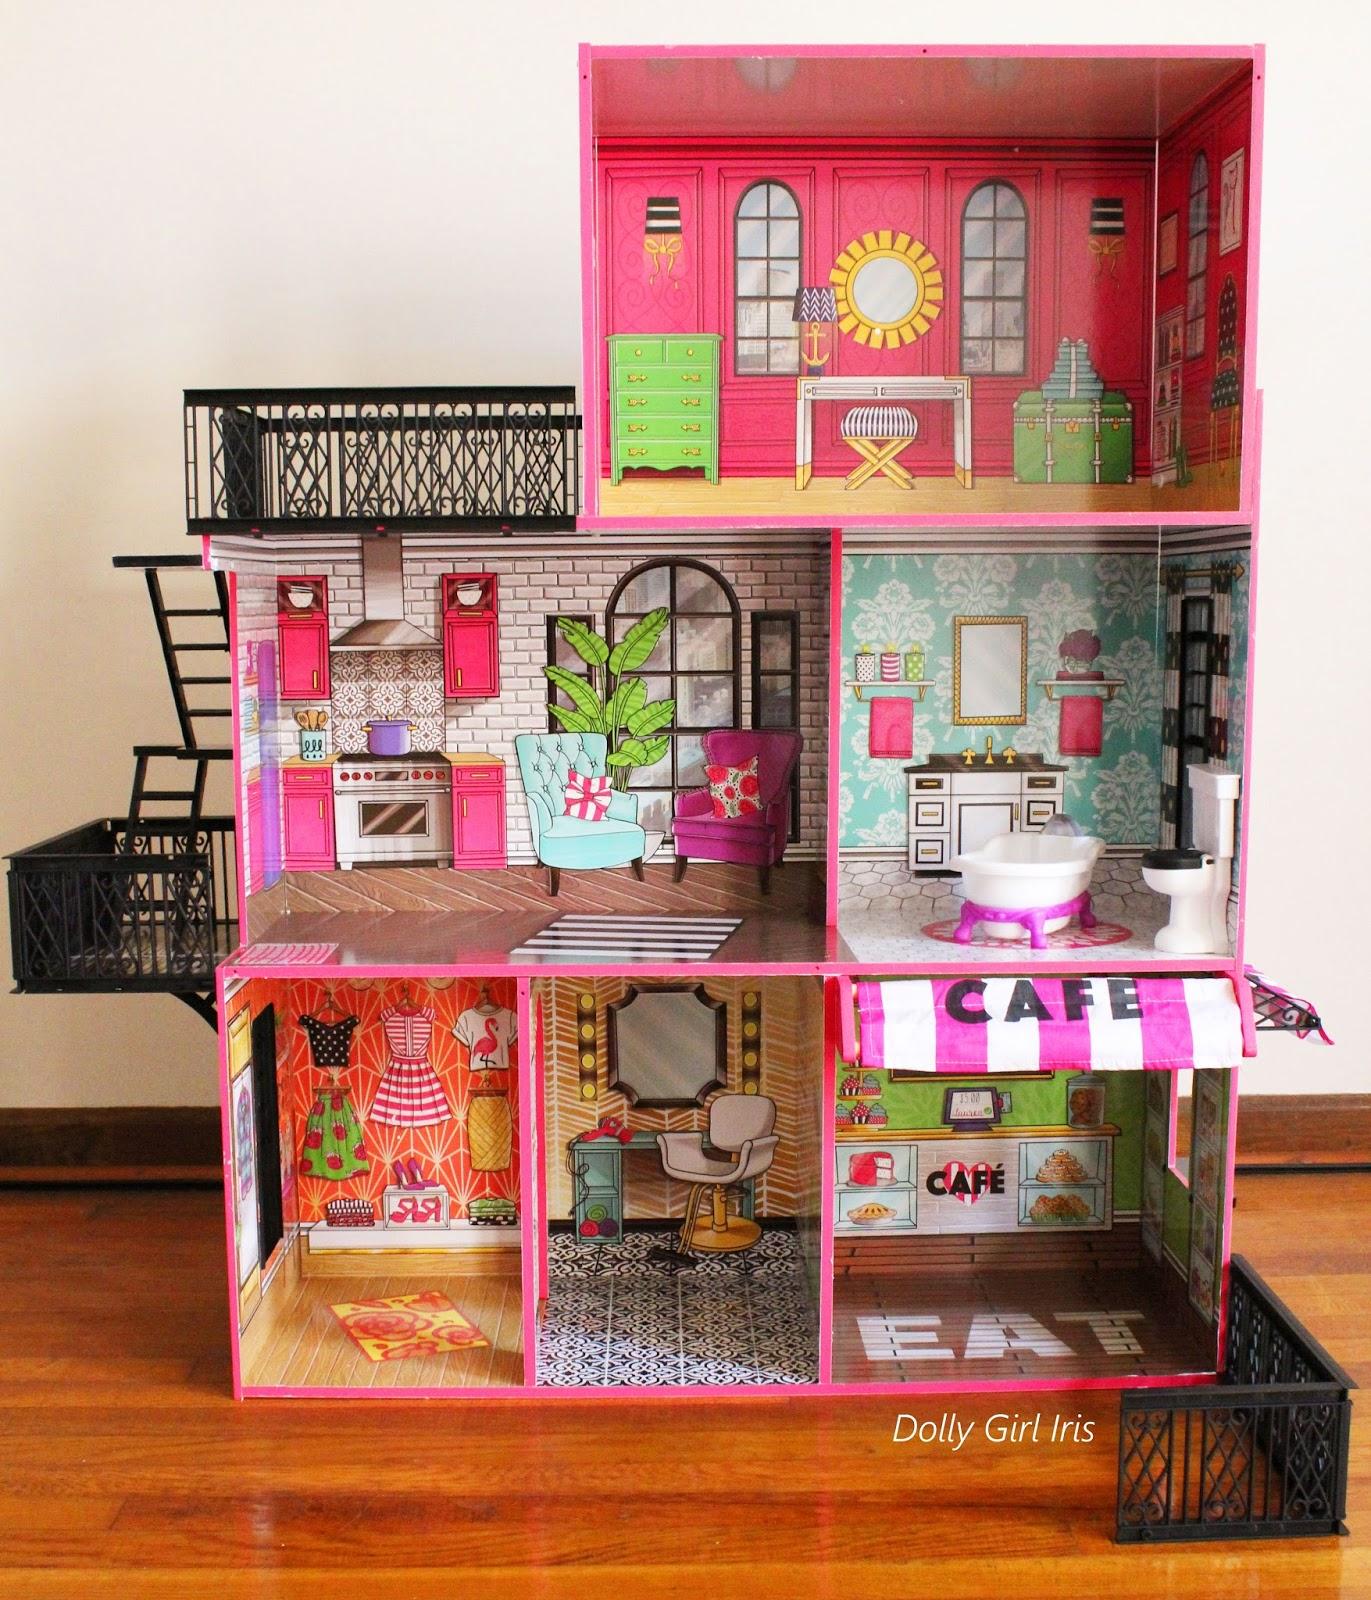 Brooklyn S Loft Kidkraft Dollhouse Photos Dolly Girl Iris